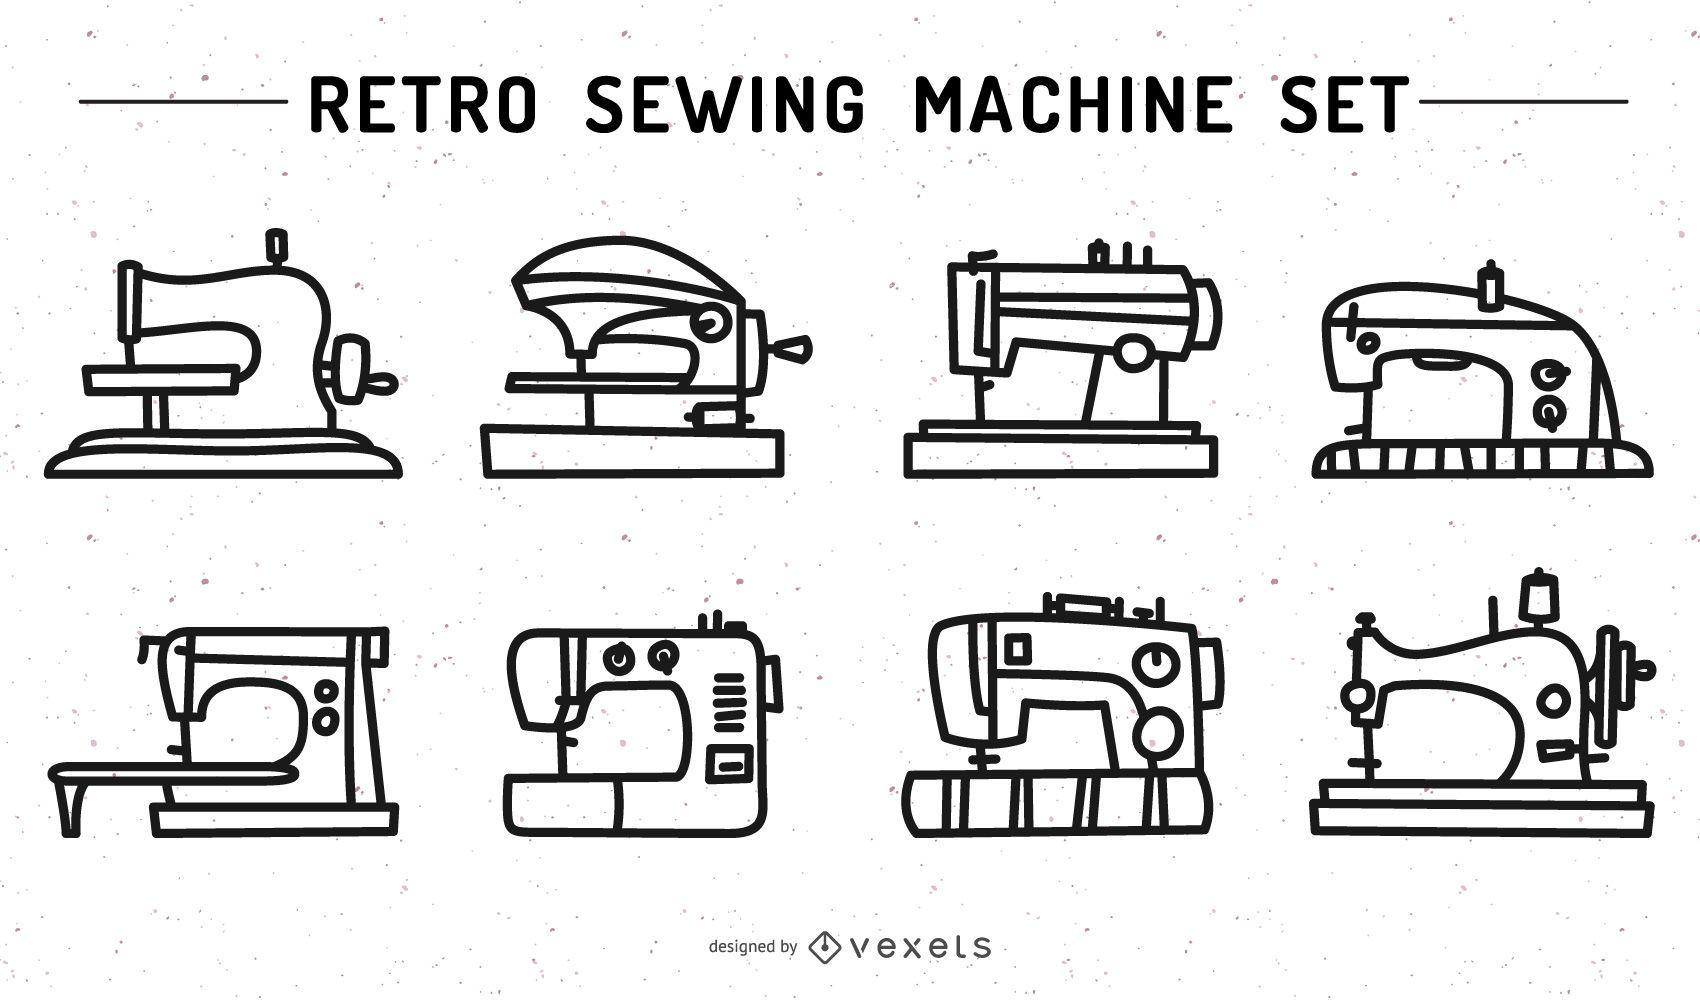 Retro sewing machine stroke set